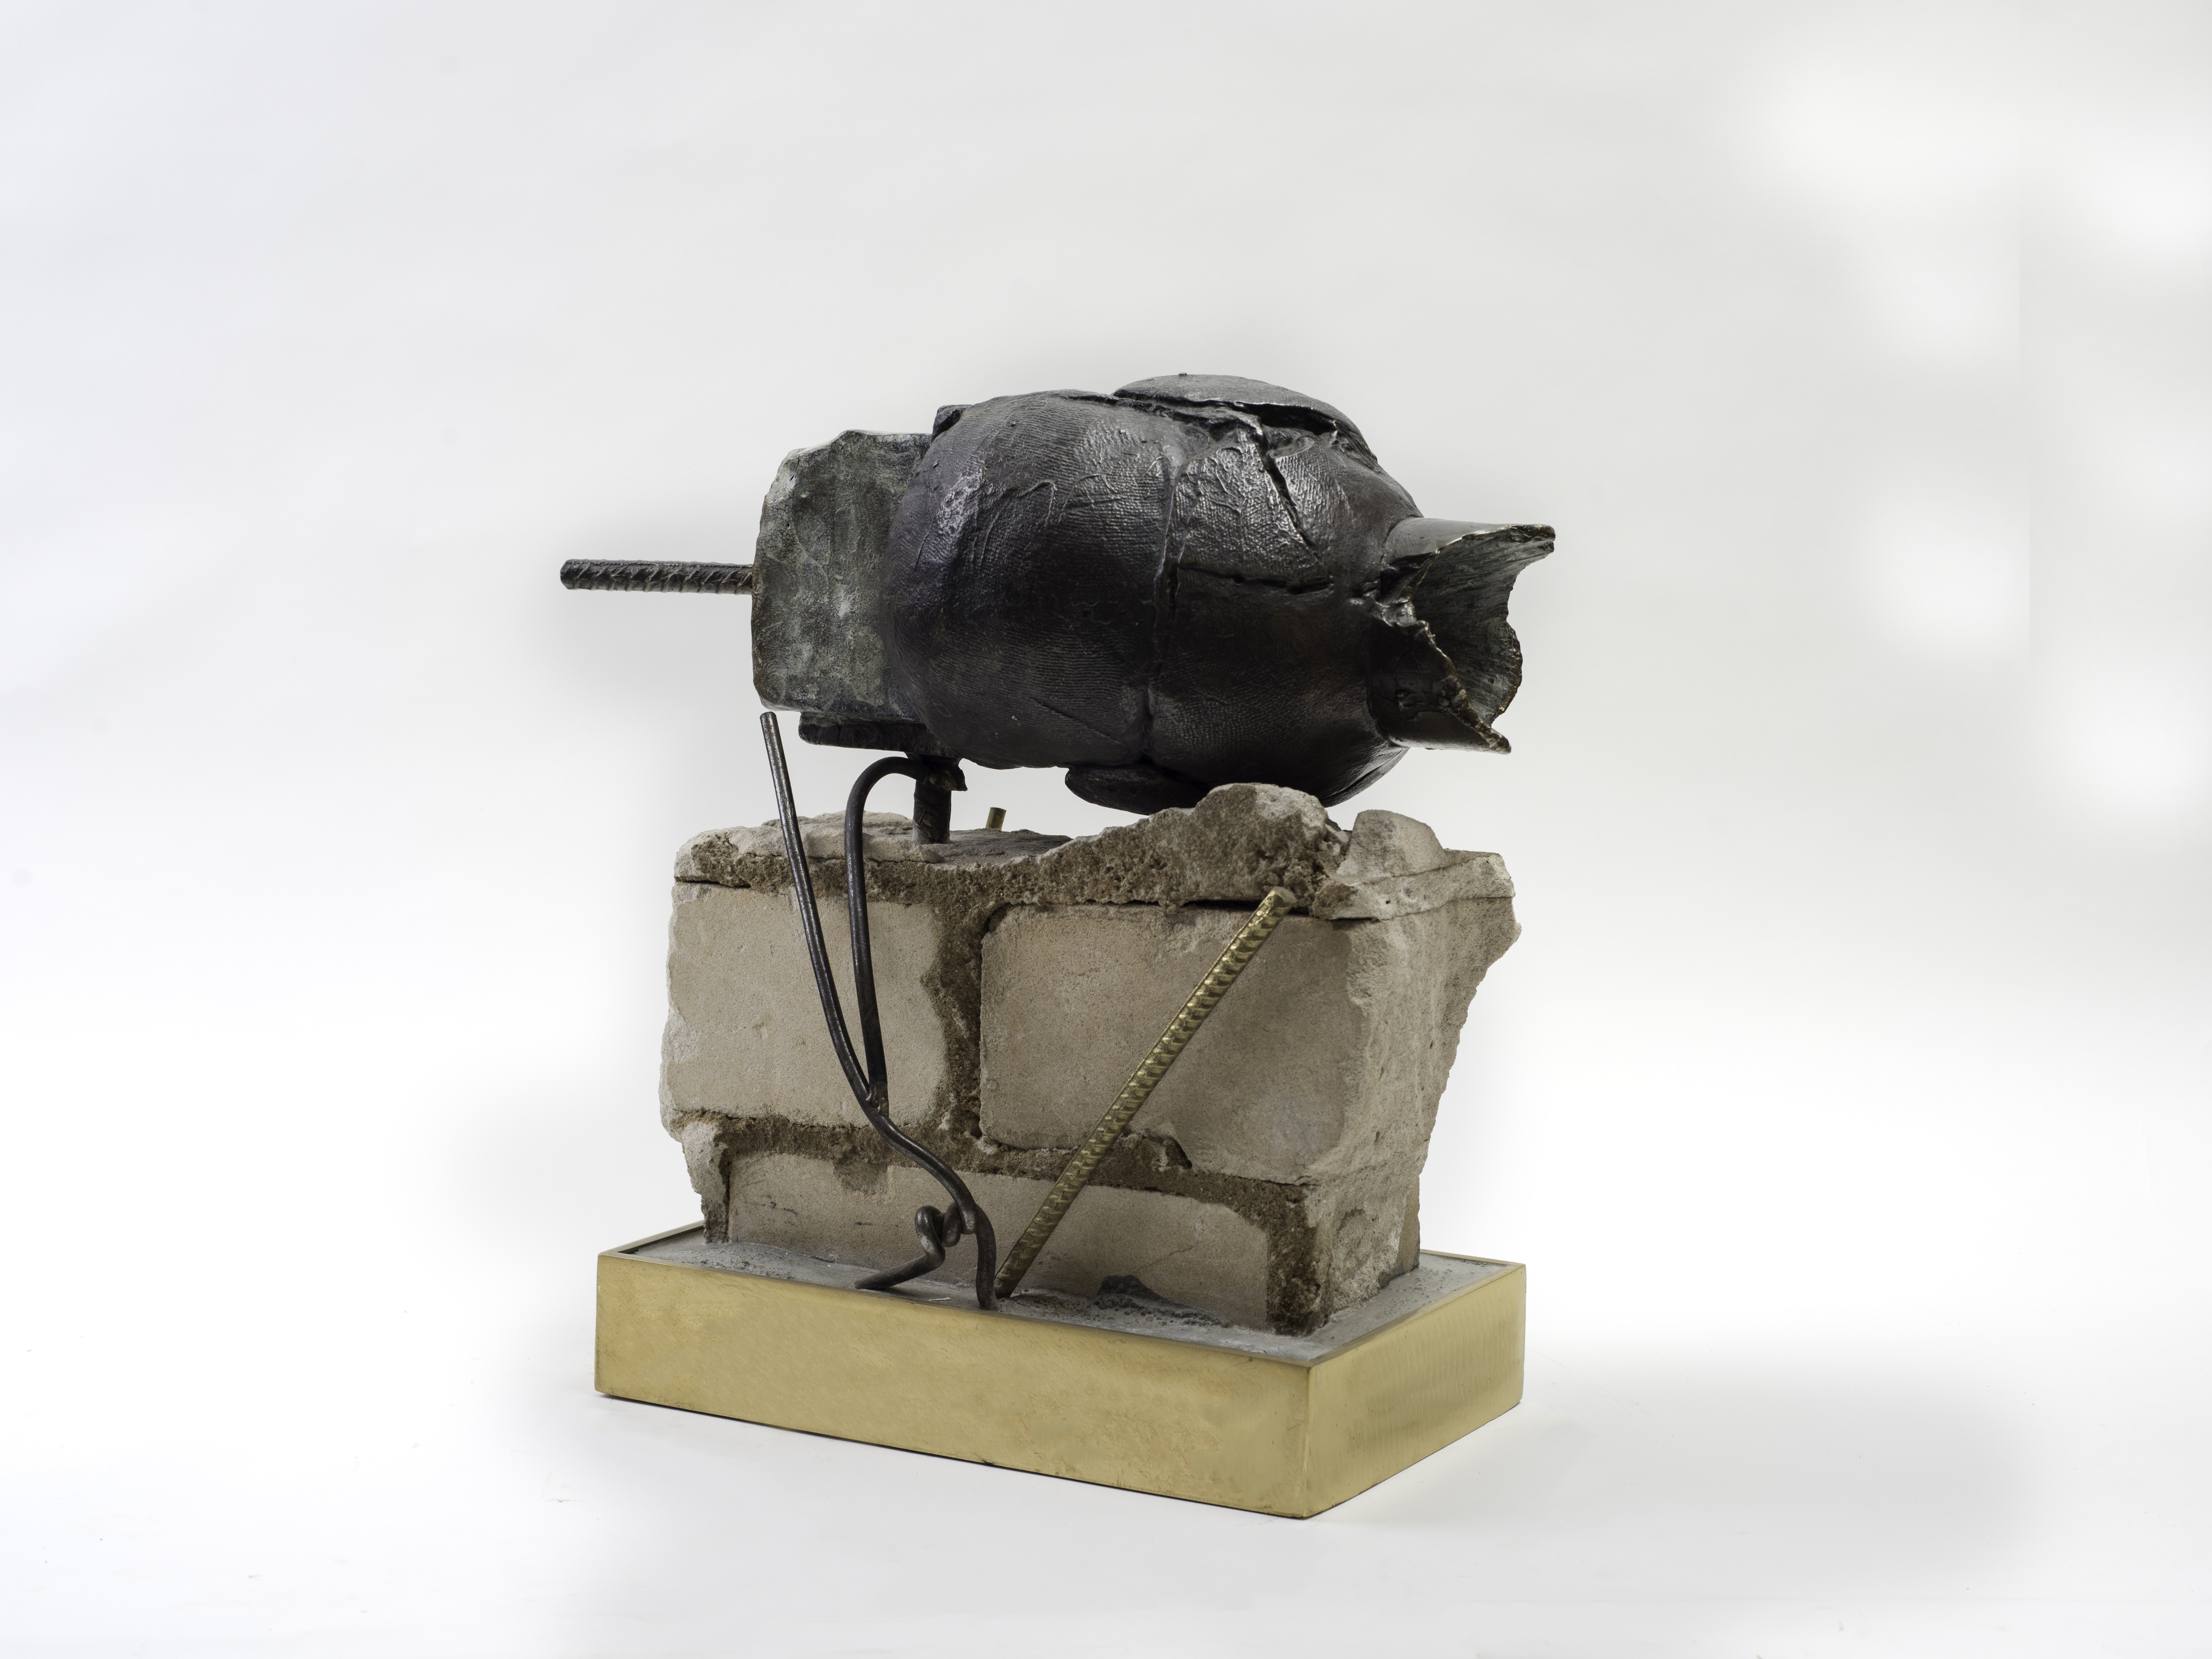 1232_Drora Dominey, Head with Wound, Bronze, iron, concrete and buildings debris, 36x40x17 cm (1)-6550x4912